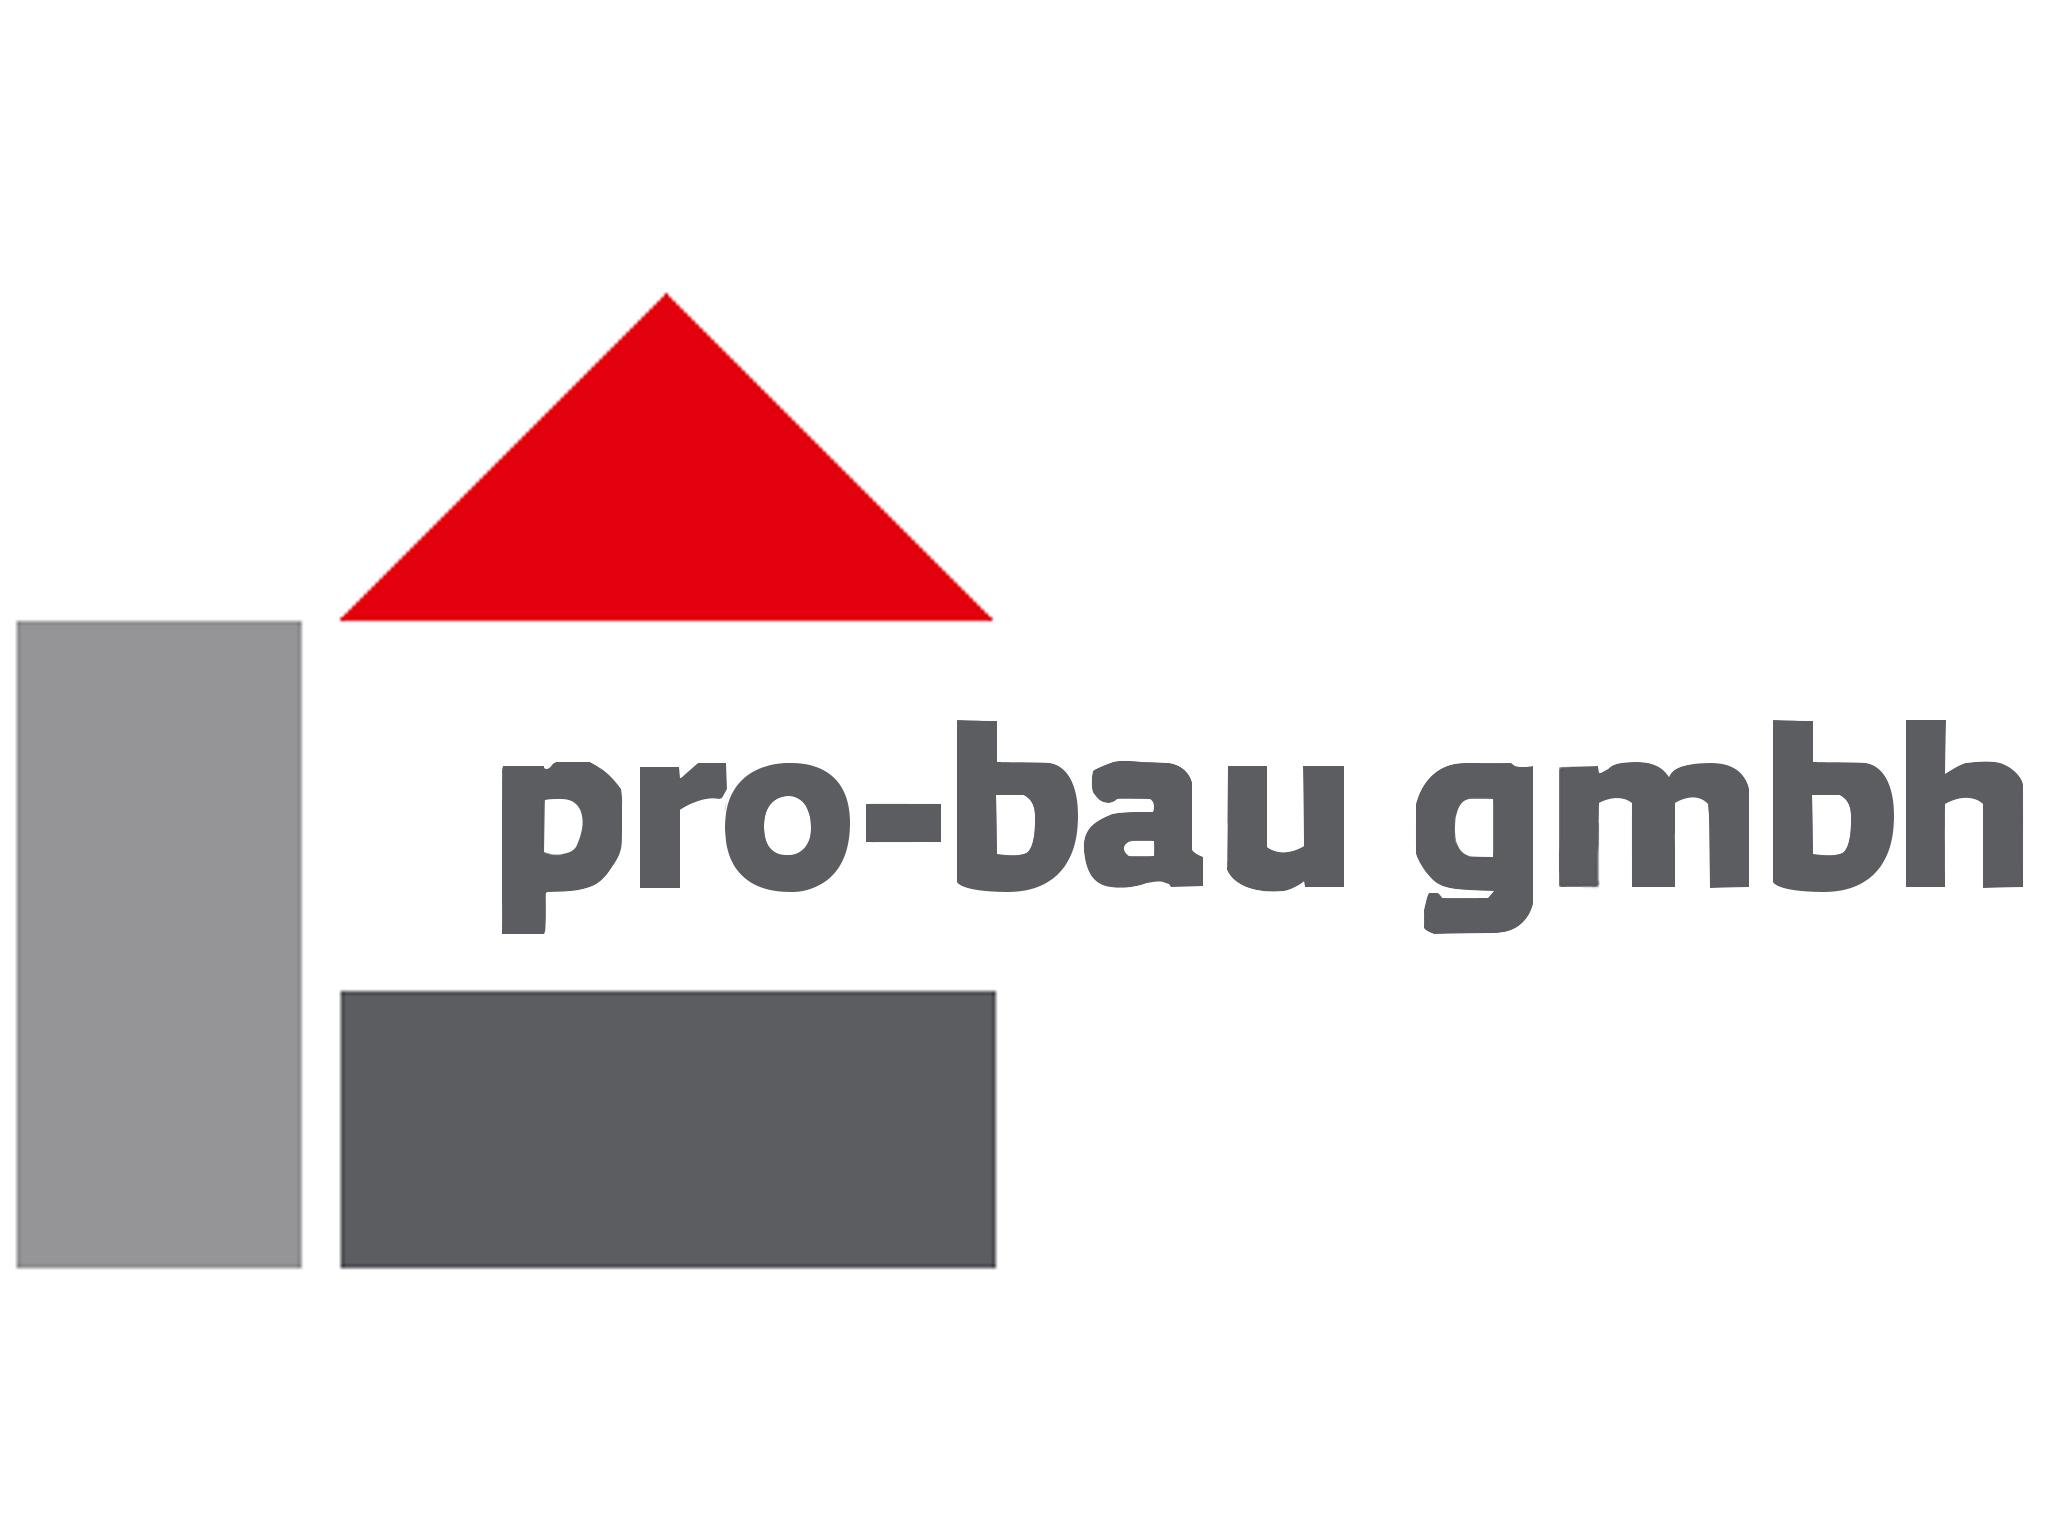 pro-bau gmbh